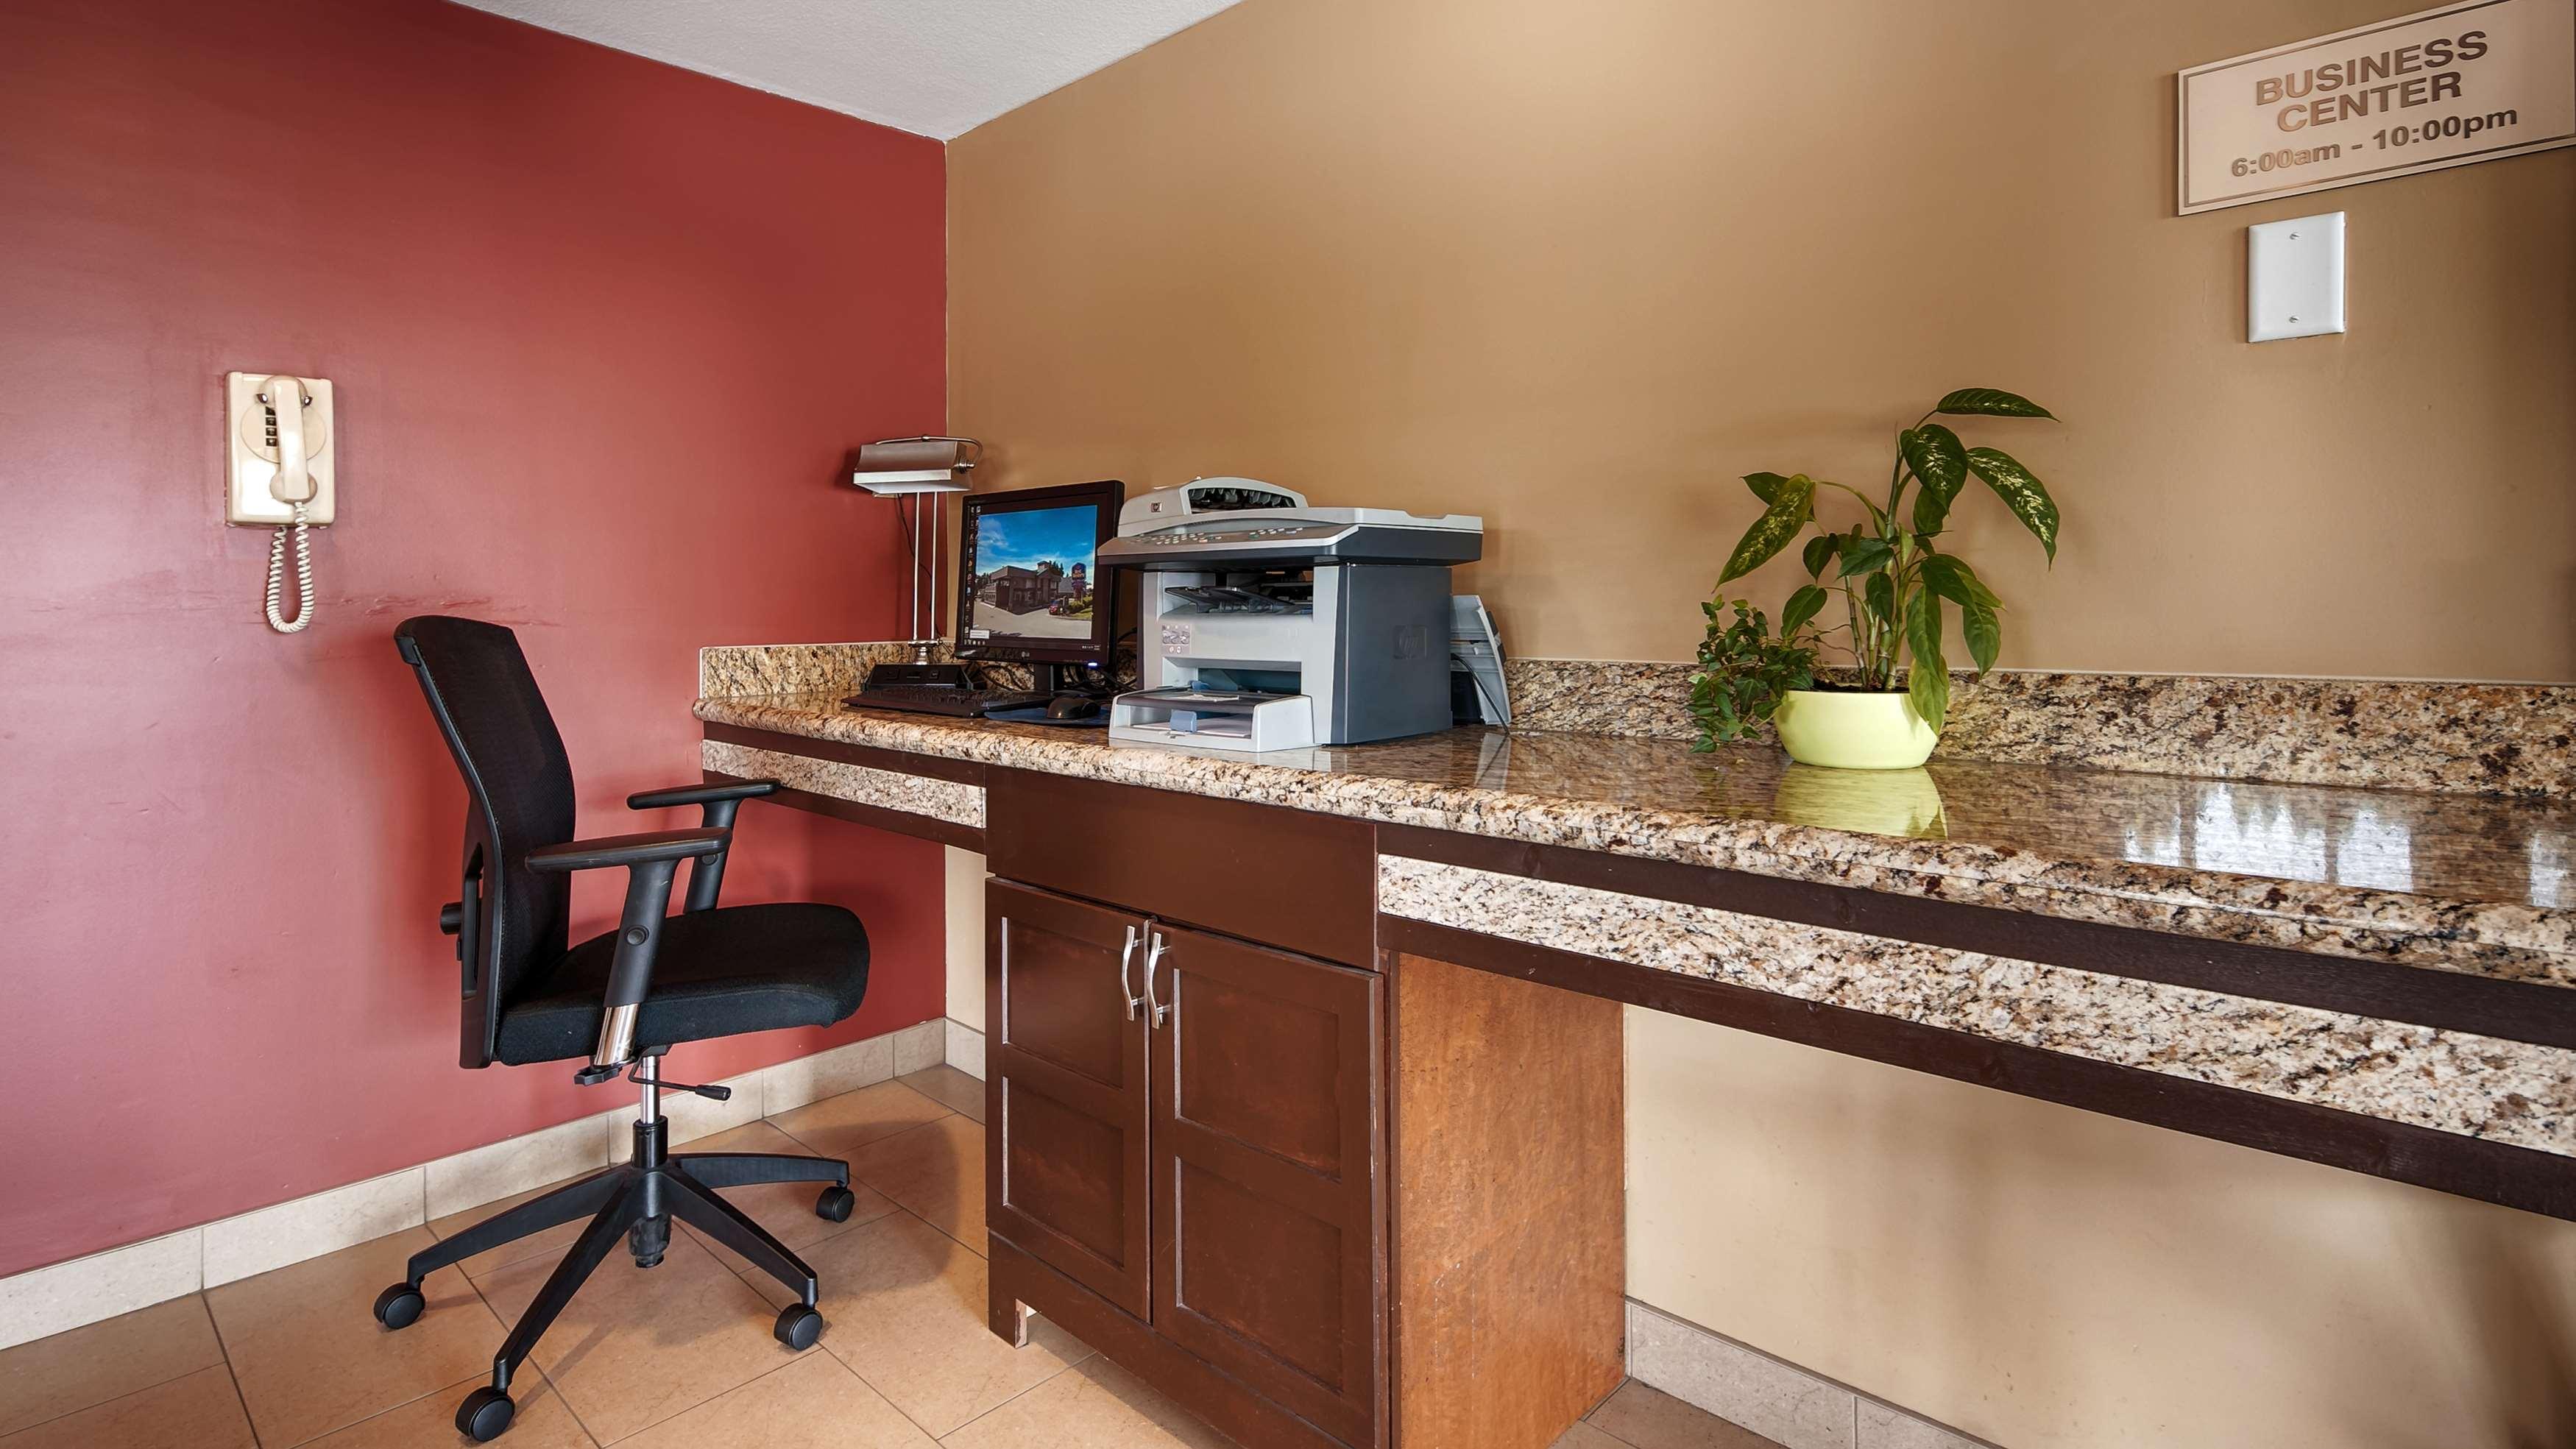 Best Western Maple Ridge Hotel in Maple Ridge: Business Center